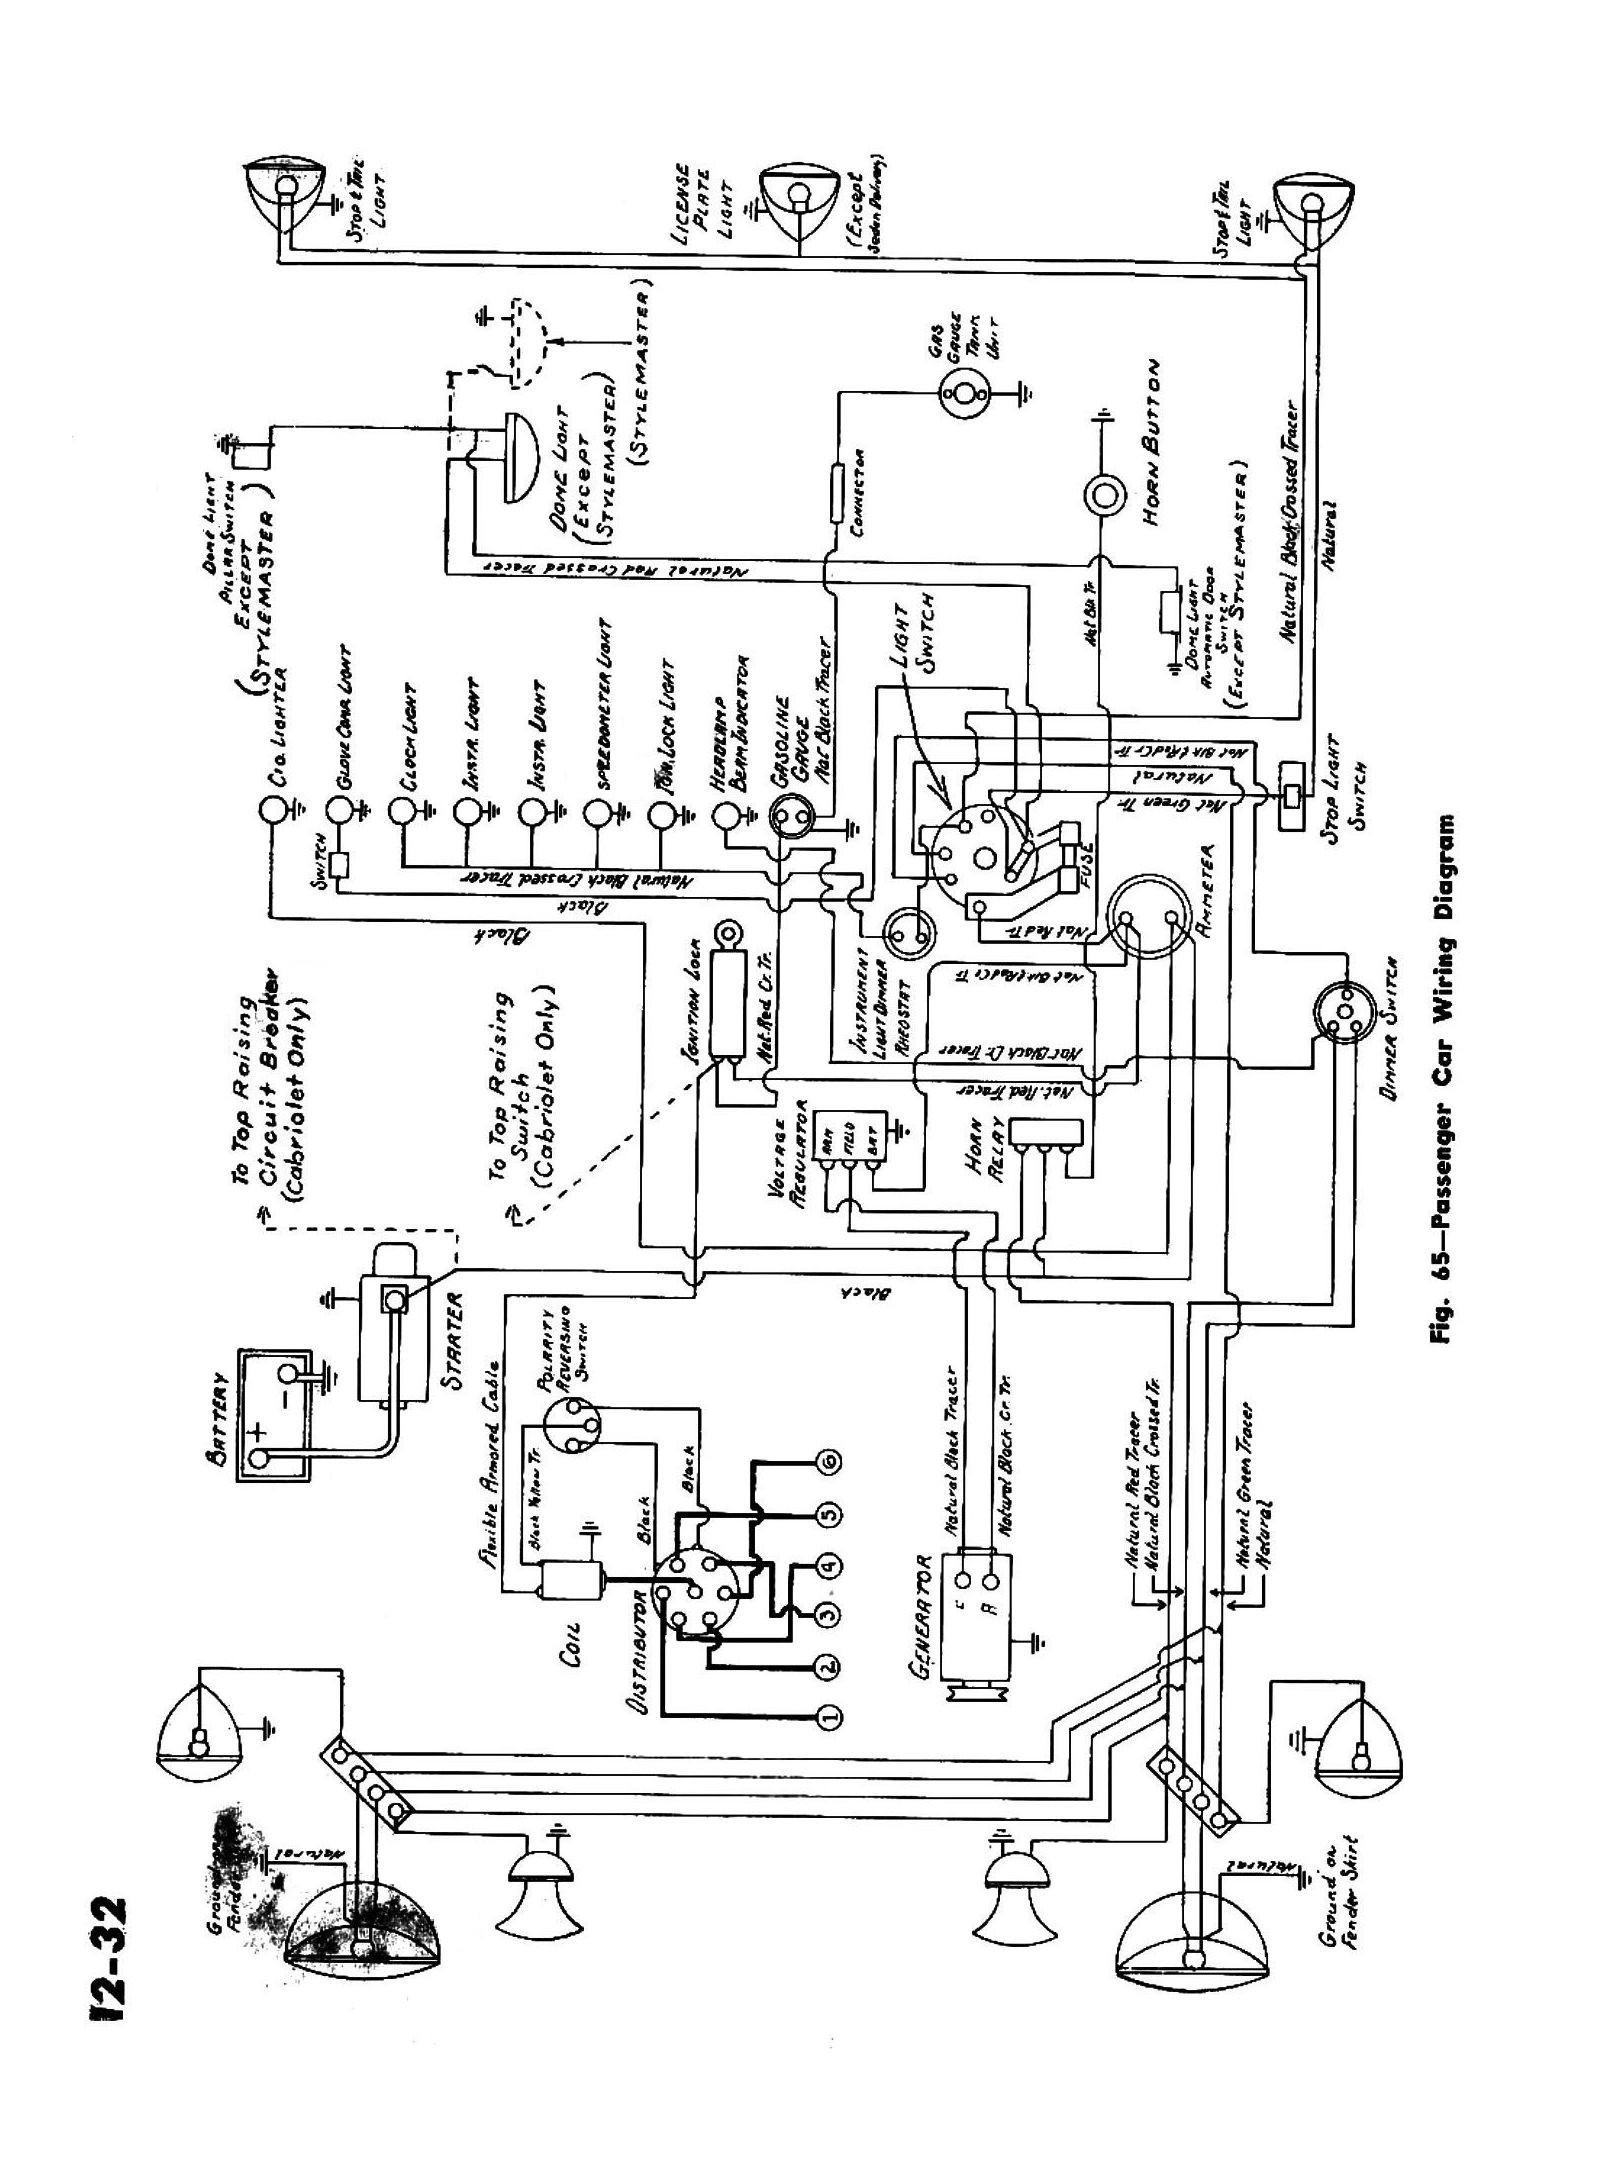 Cars Wiring Diagram | Wiring Diagram - Auto Wiring Diagram